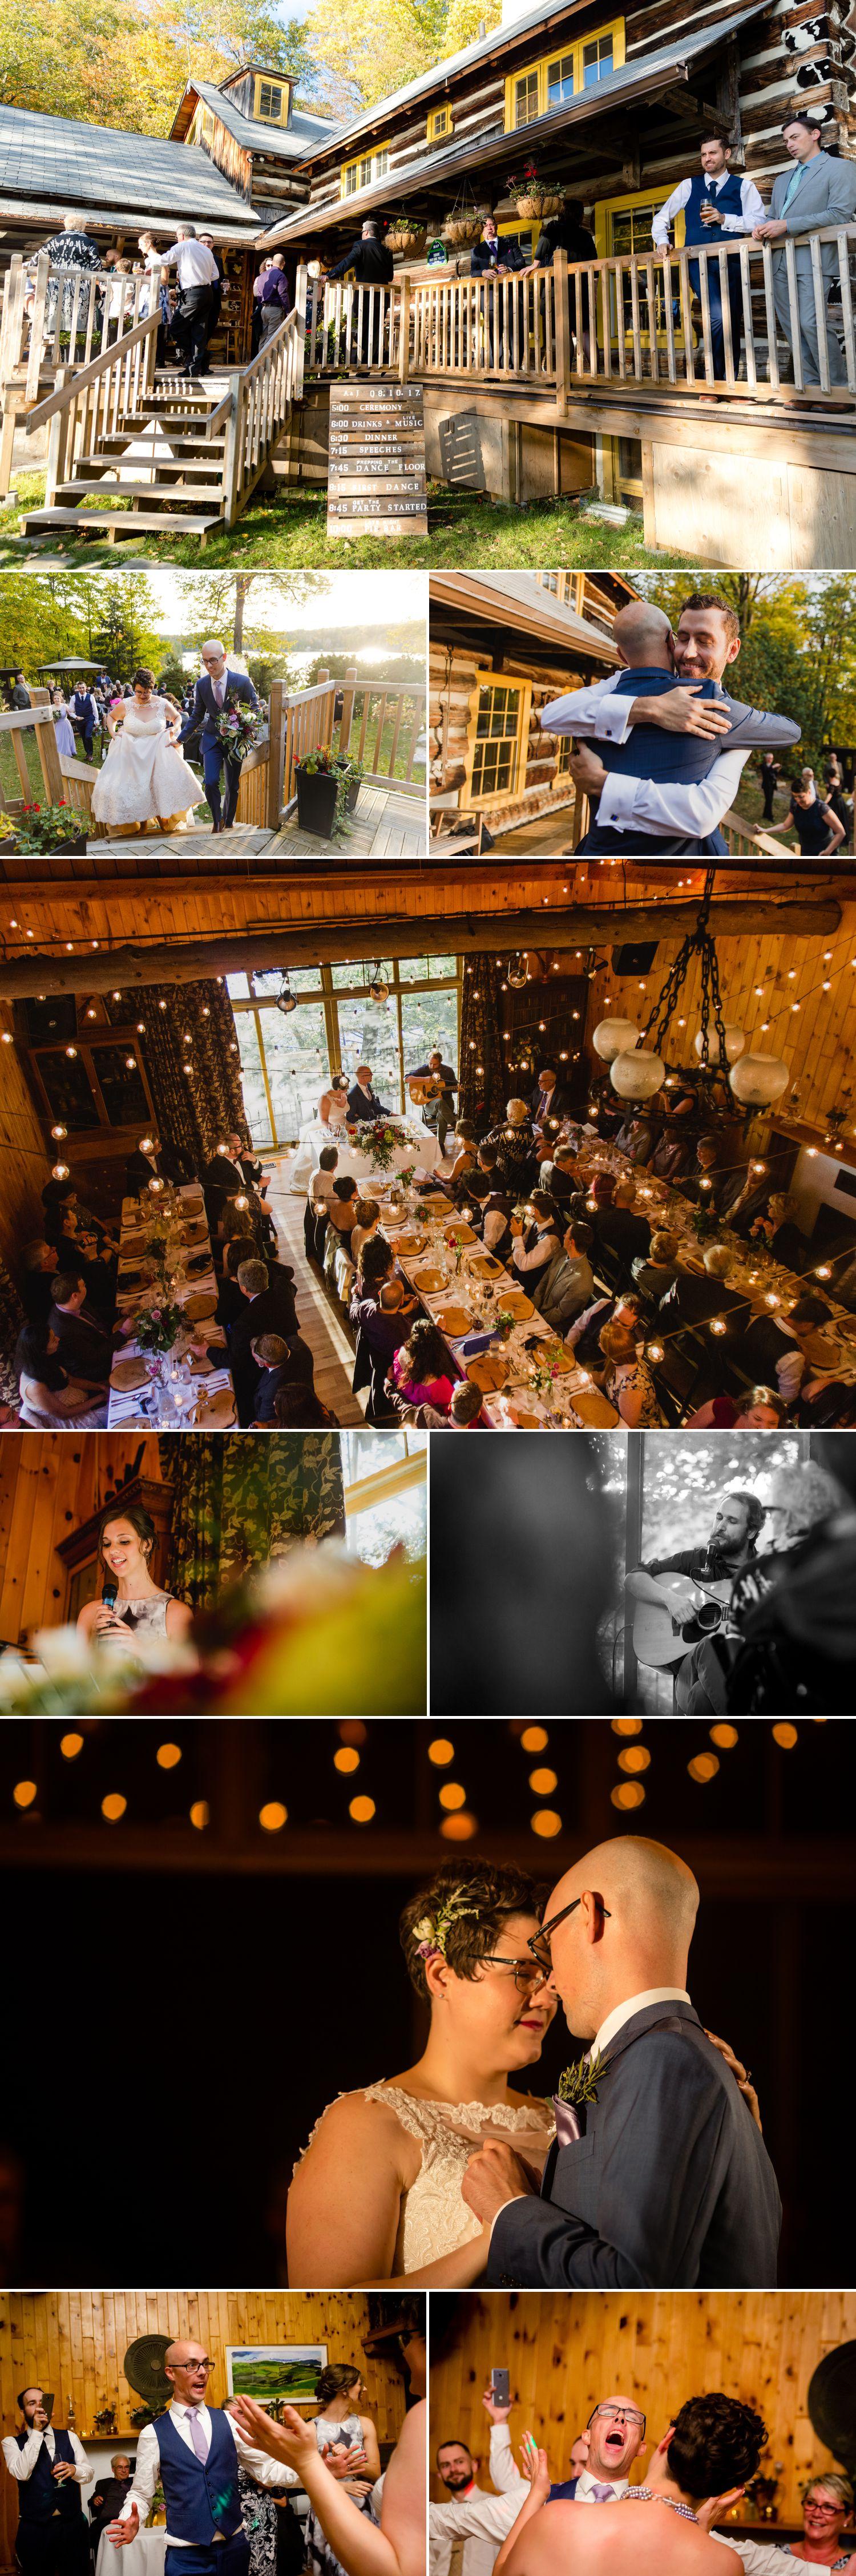 A wedding reception help at La Grange de la Gatineau